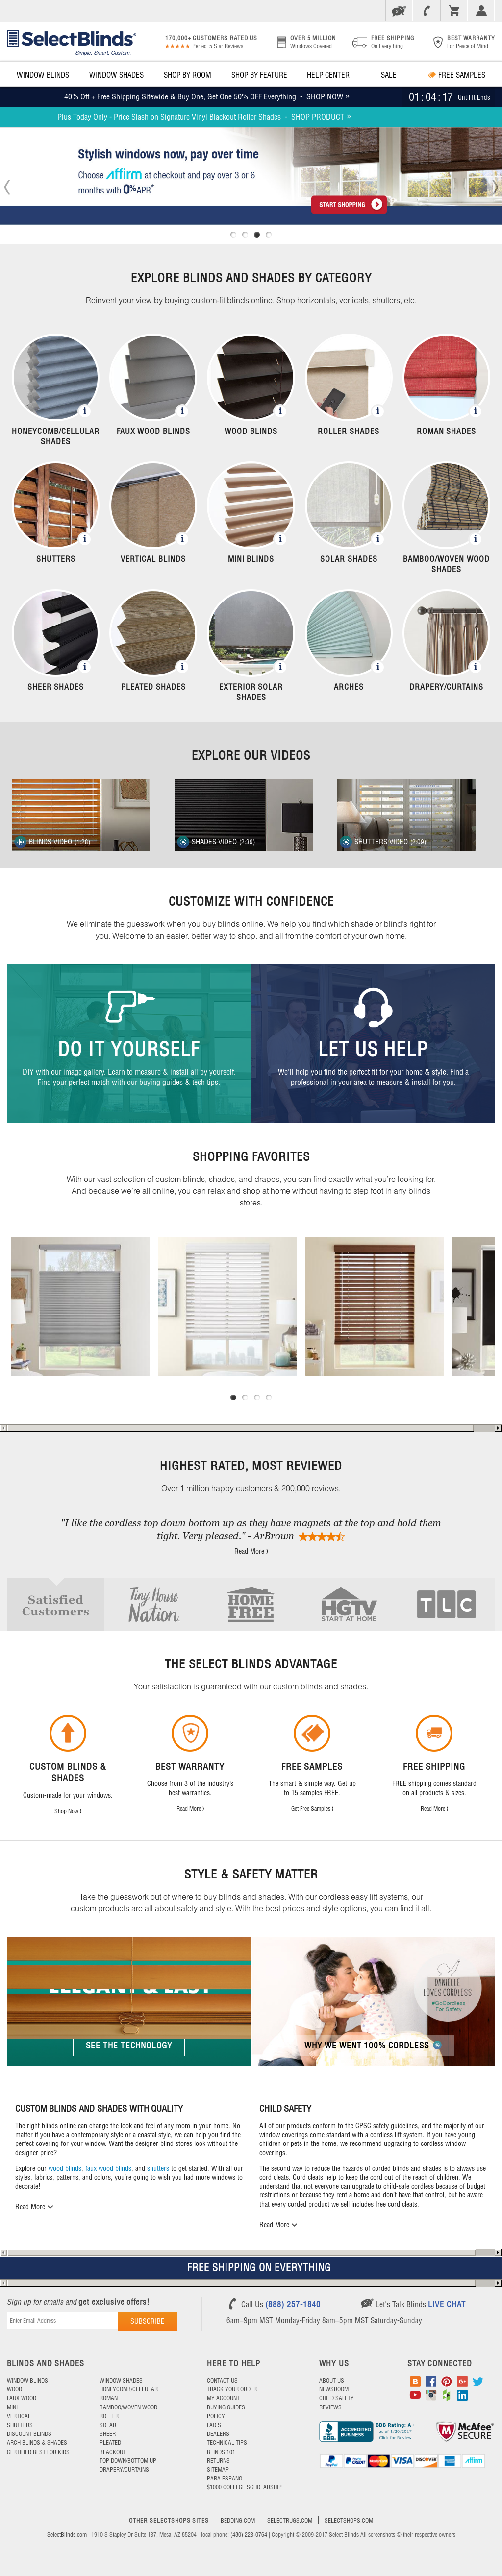 com inspiring interiors blog select spot decorator holly the blinds mathis